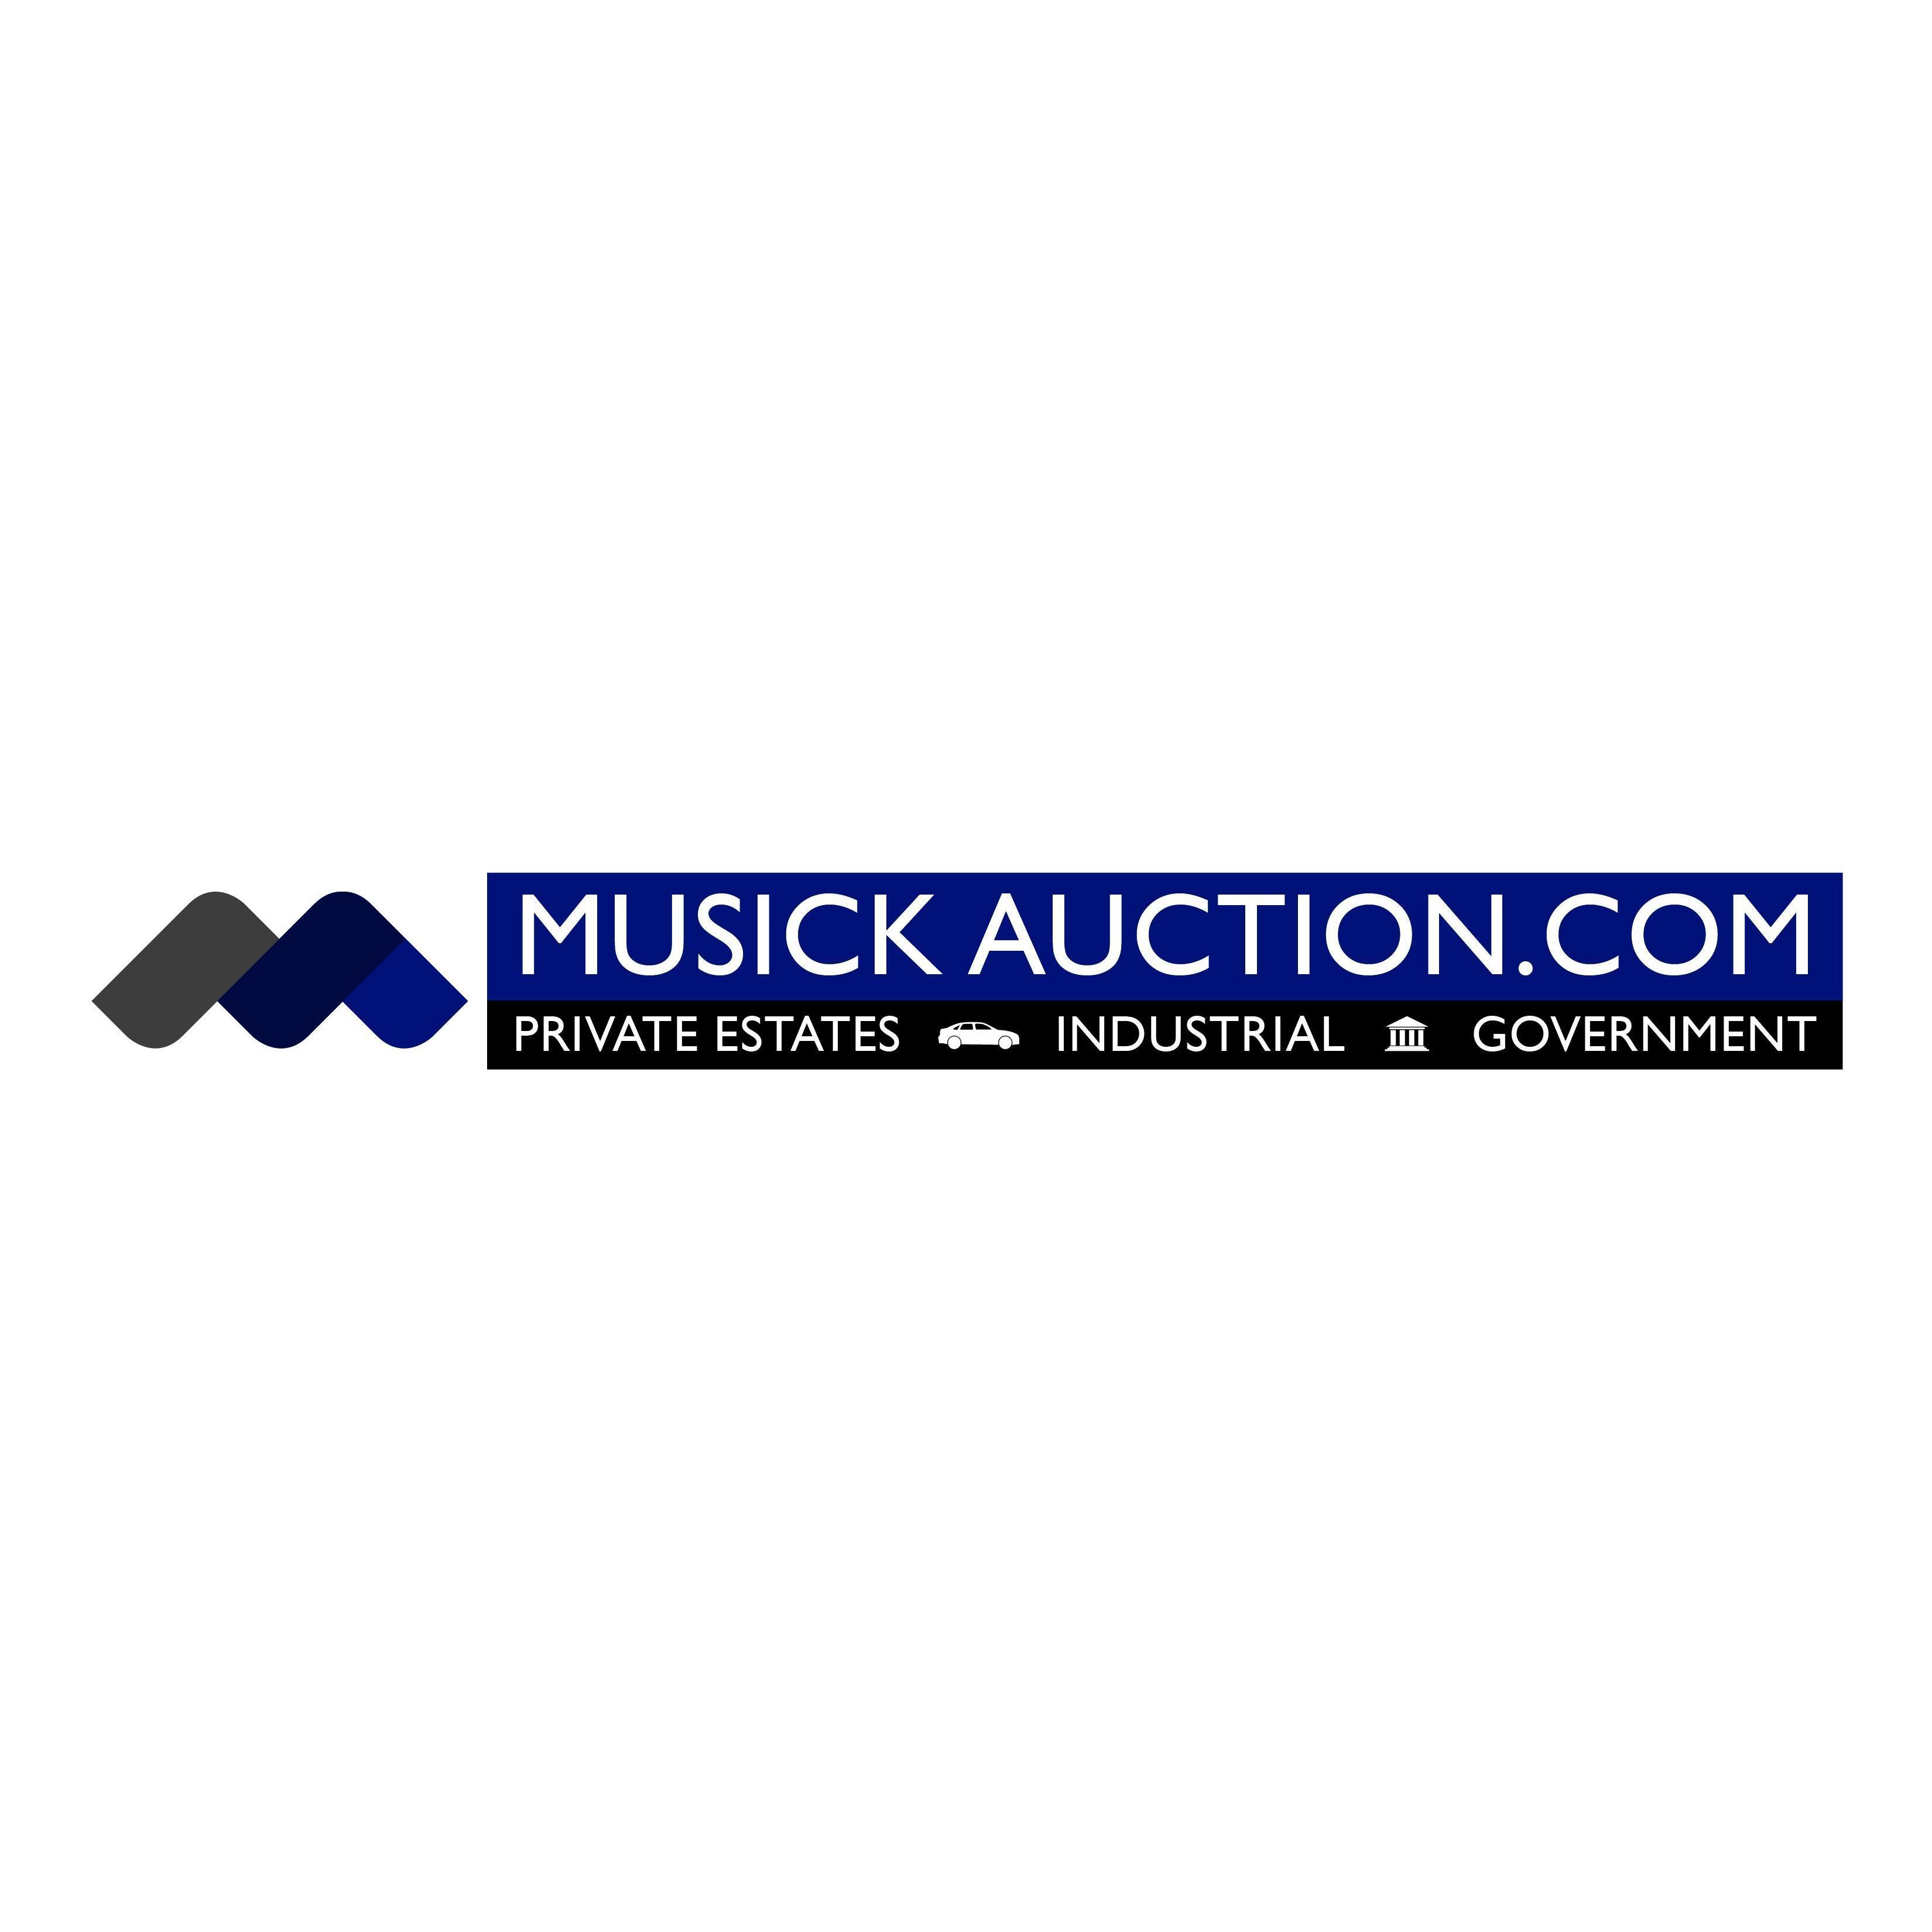 Musick Auction image 9